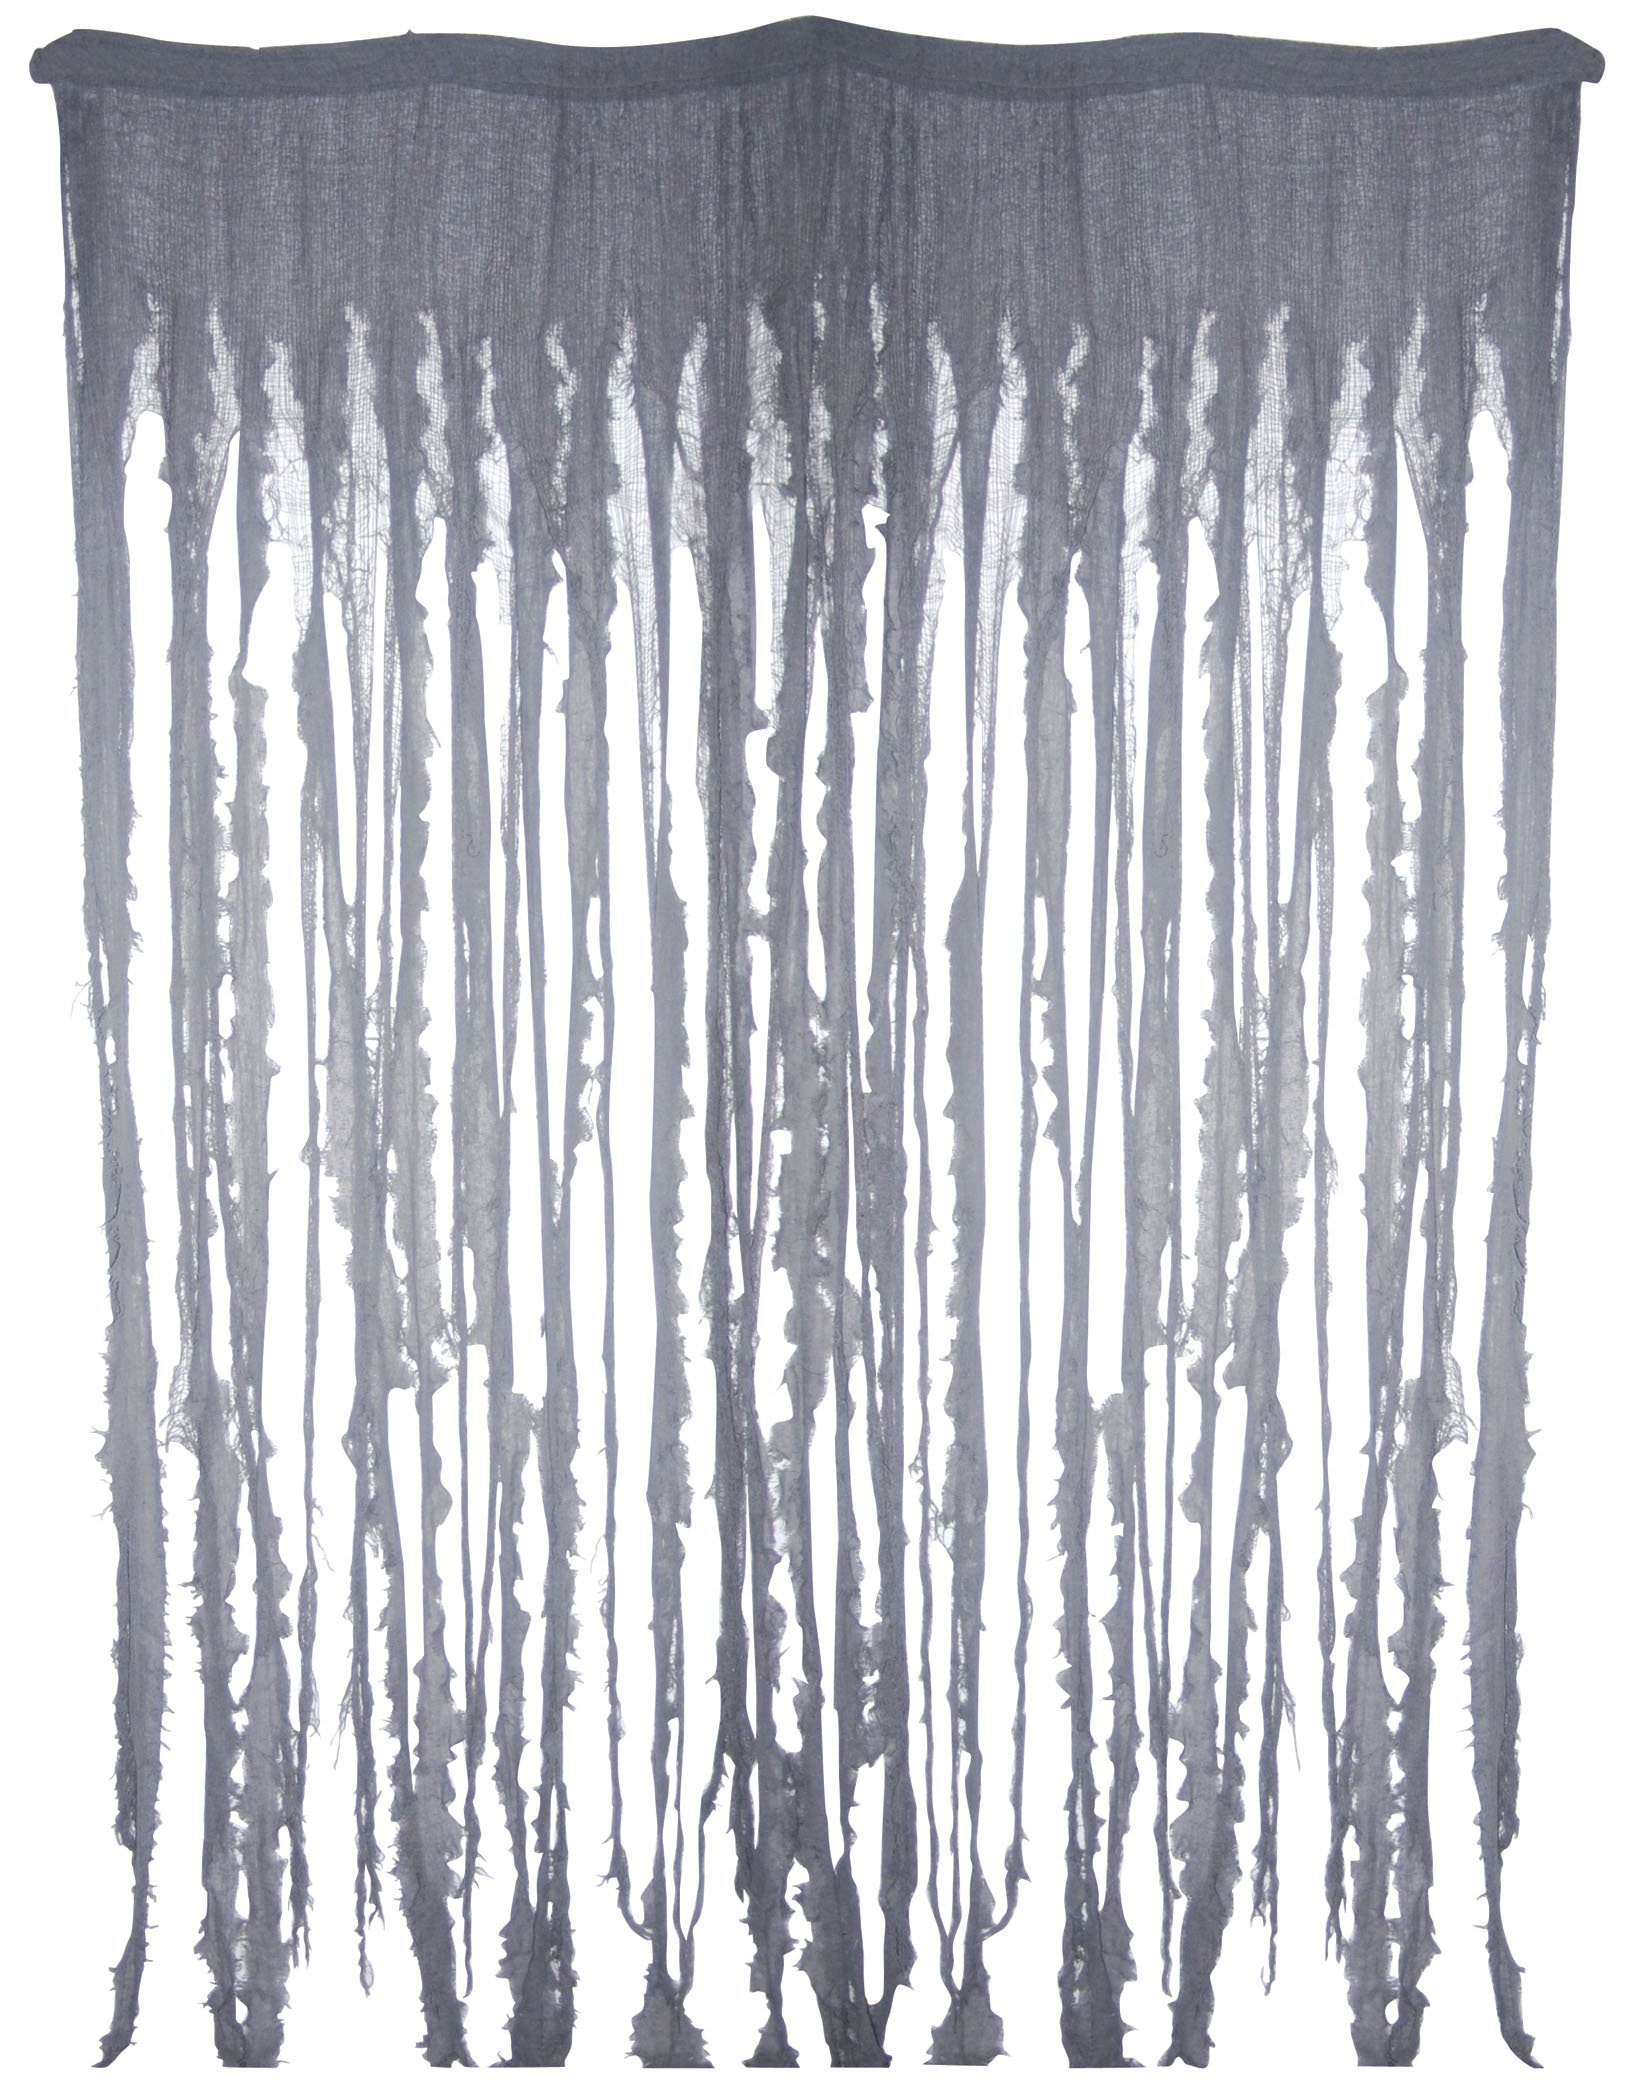 Sunstar Industries SM38830-M Creepy Cloth Curtain